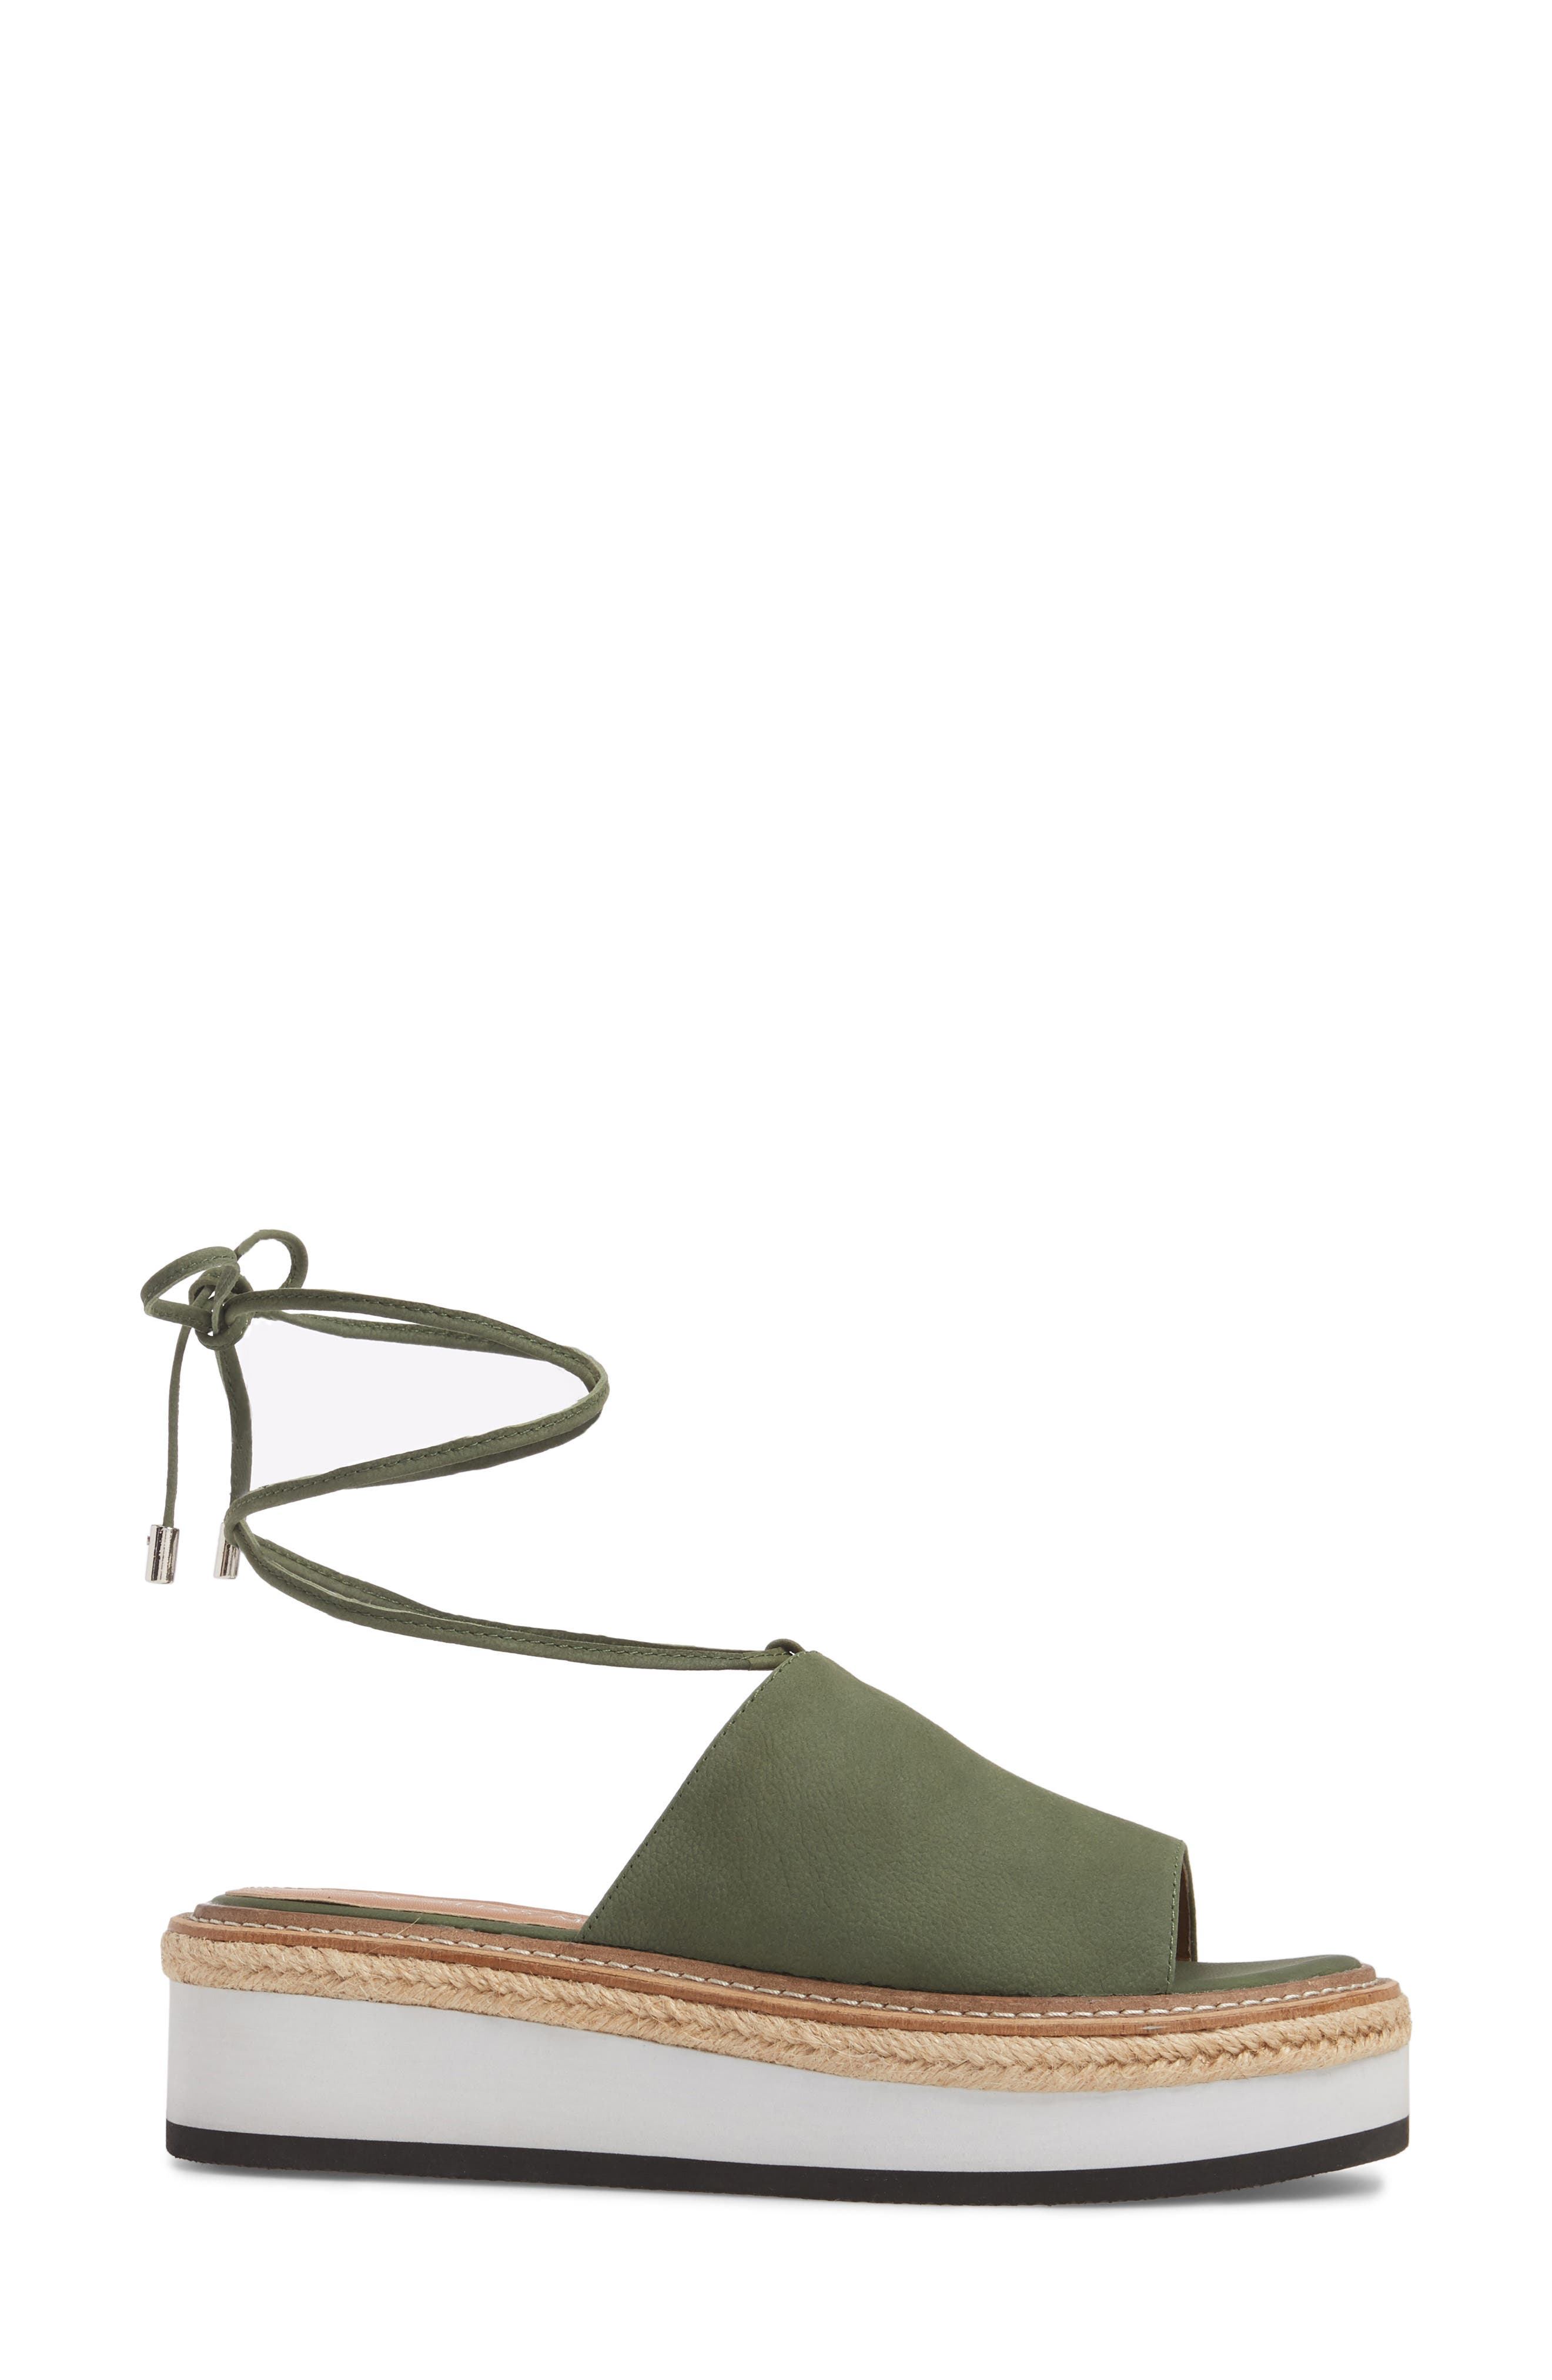 Nickel Platform Sandal,                             Alternate thumbnail 3, color,                             Khaki Nubuck Leather